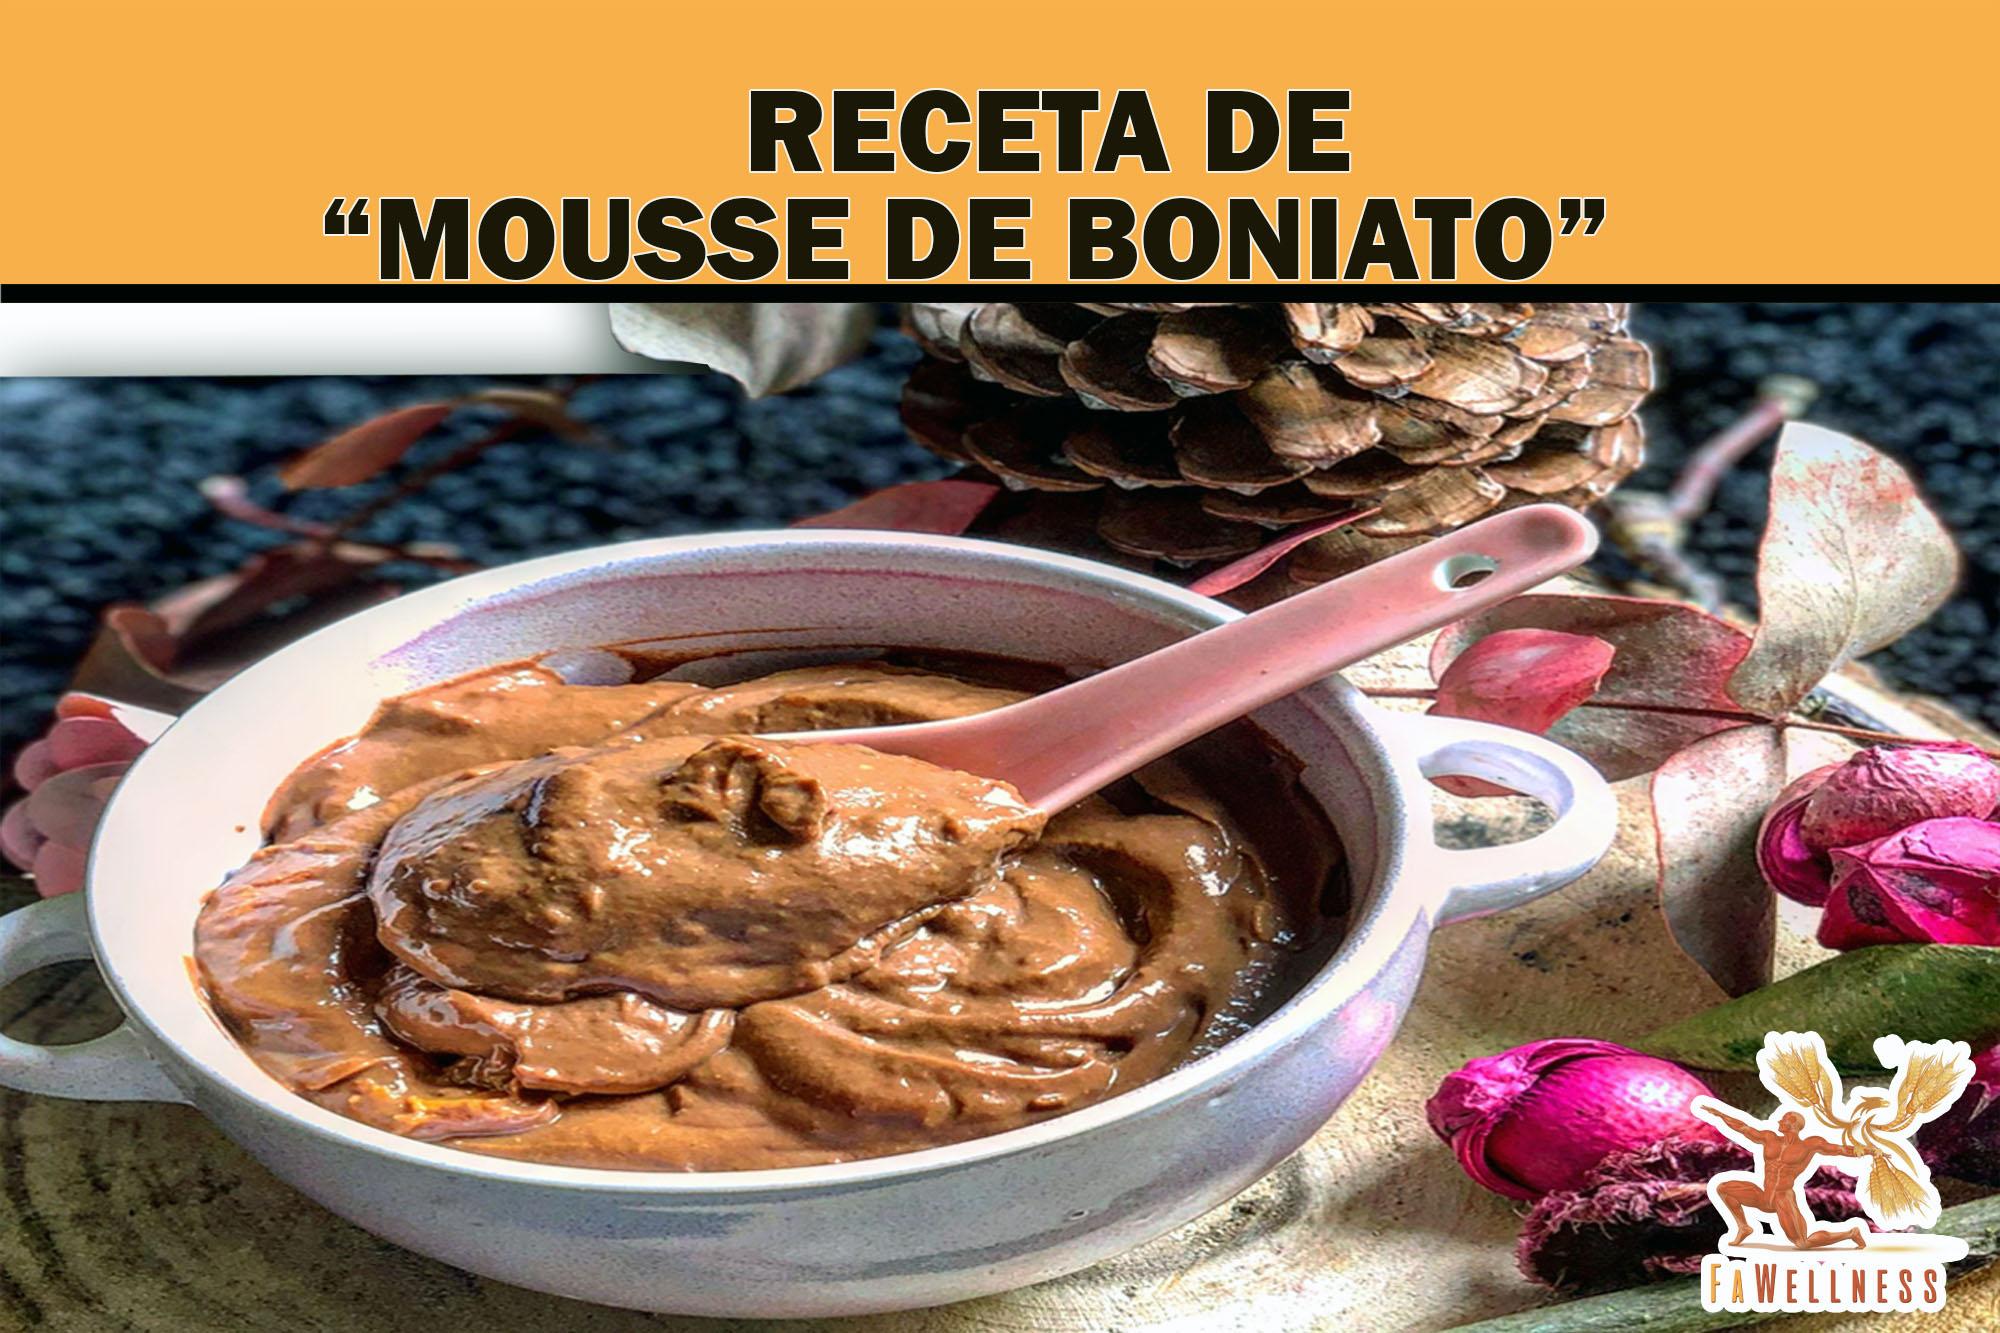 imagen blog FaWellness | MOUSSE DE BONIATO